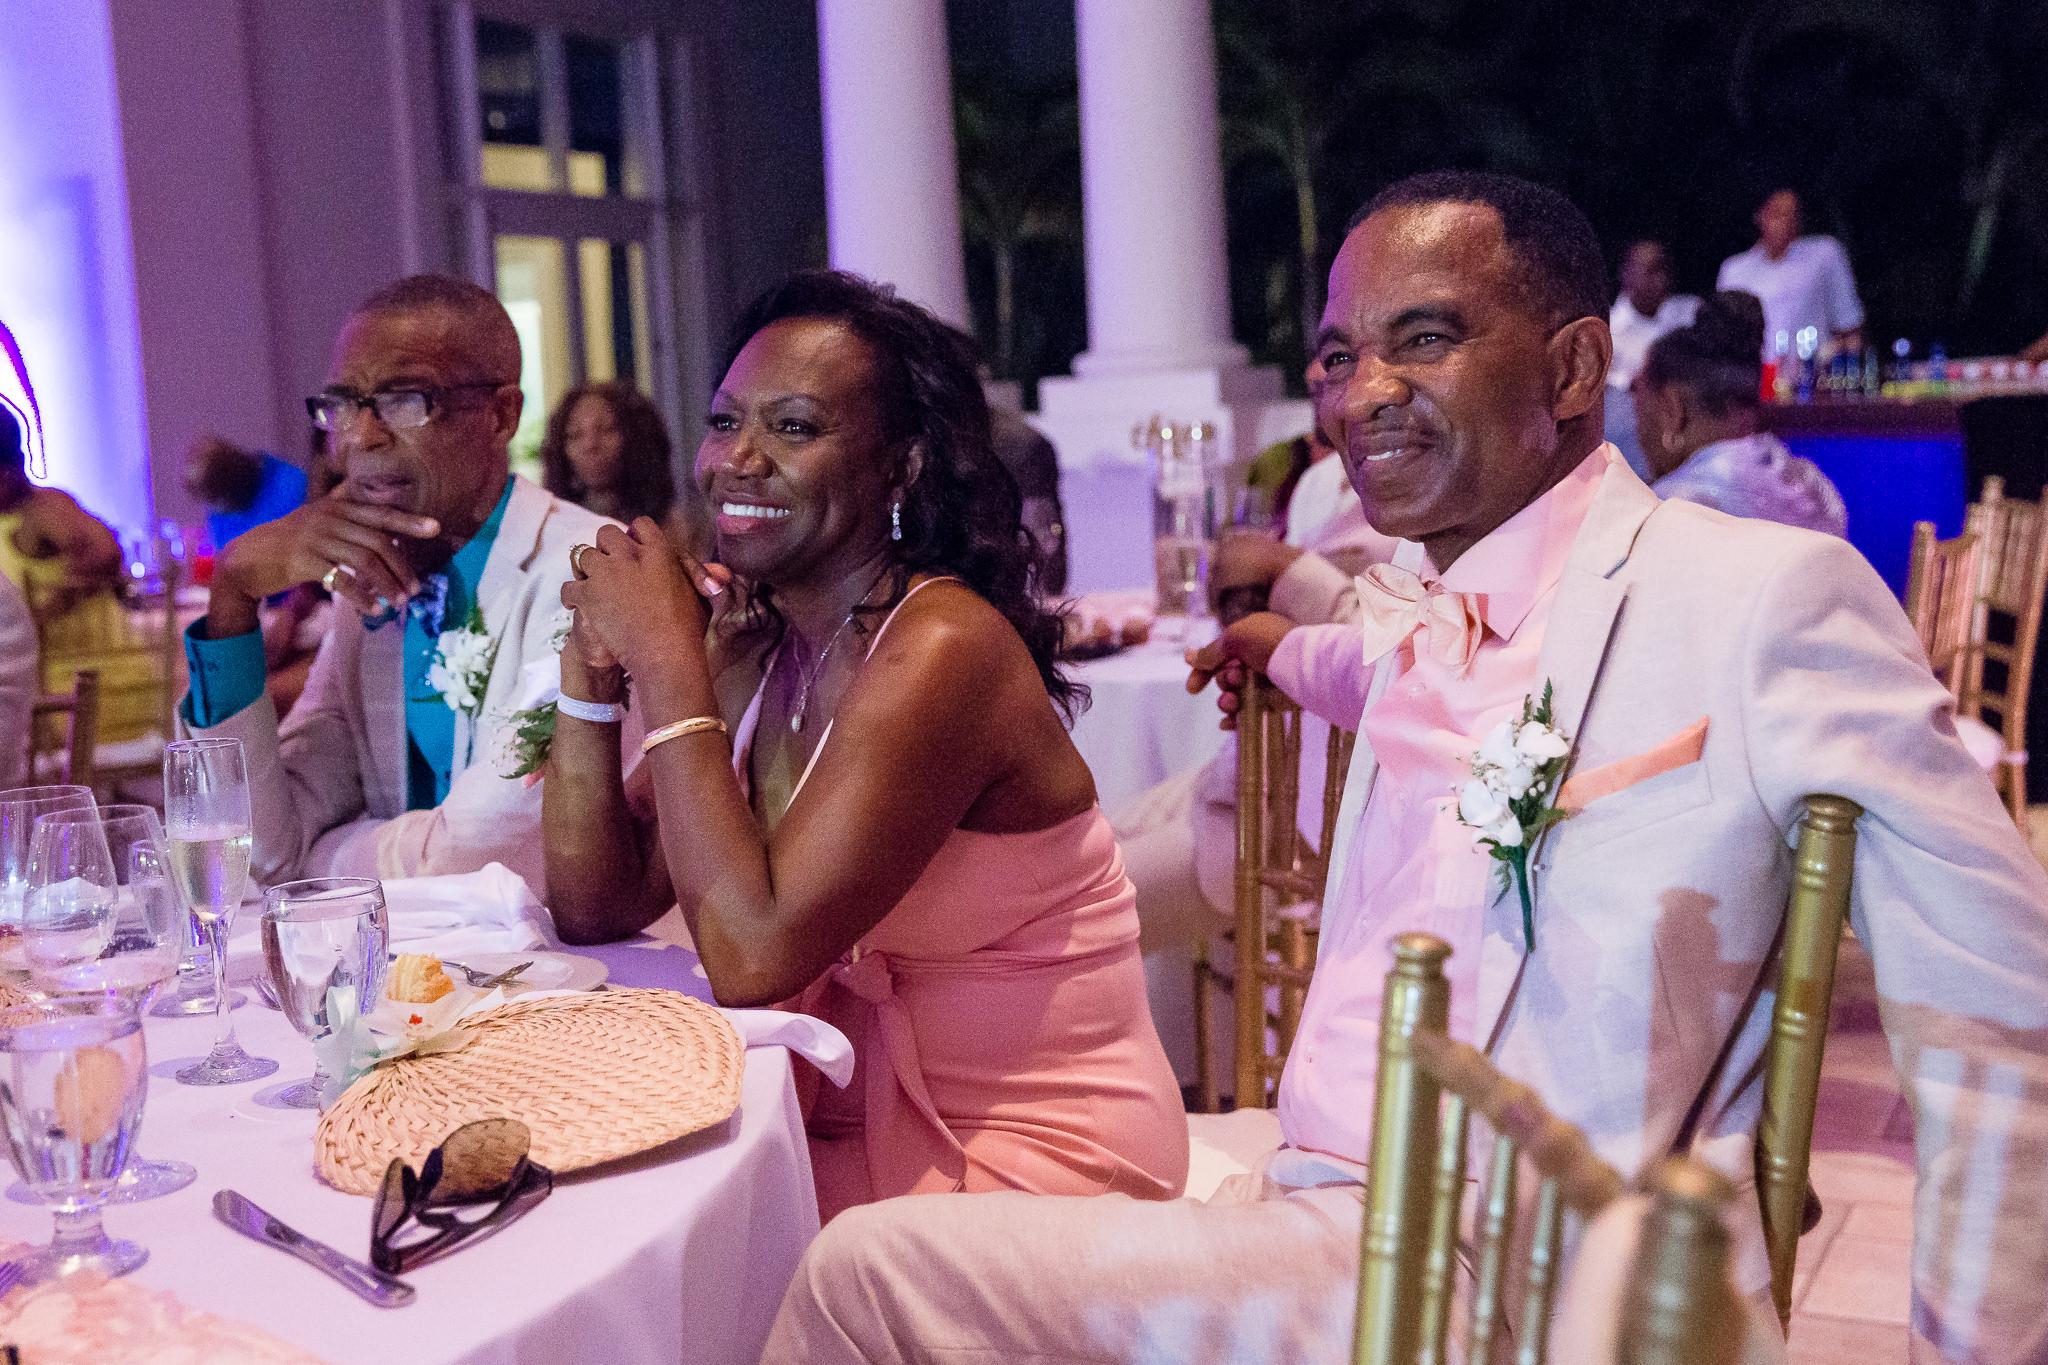 nyc destination wedding photographer, jamaica destination wedding, jamaica destination wedding, beach wedding inspiration, new york city destination wedding photographer, montego bay wedding